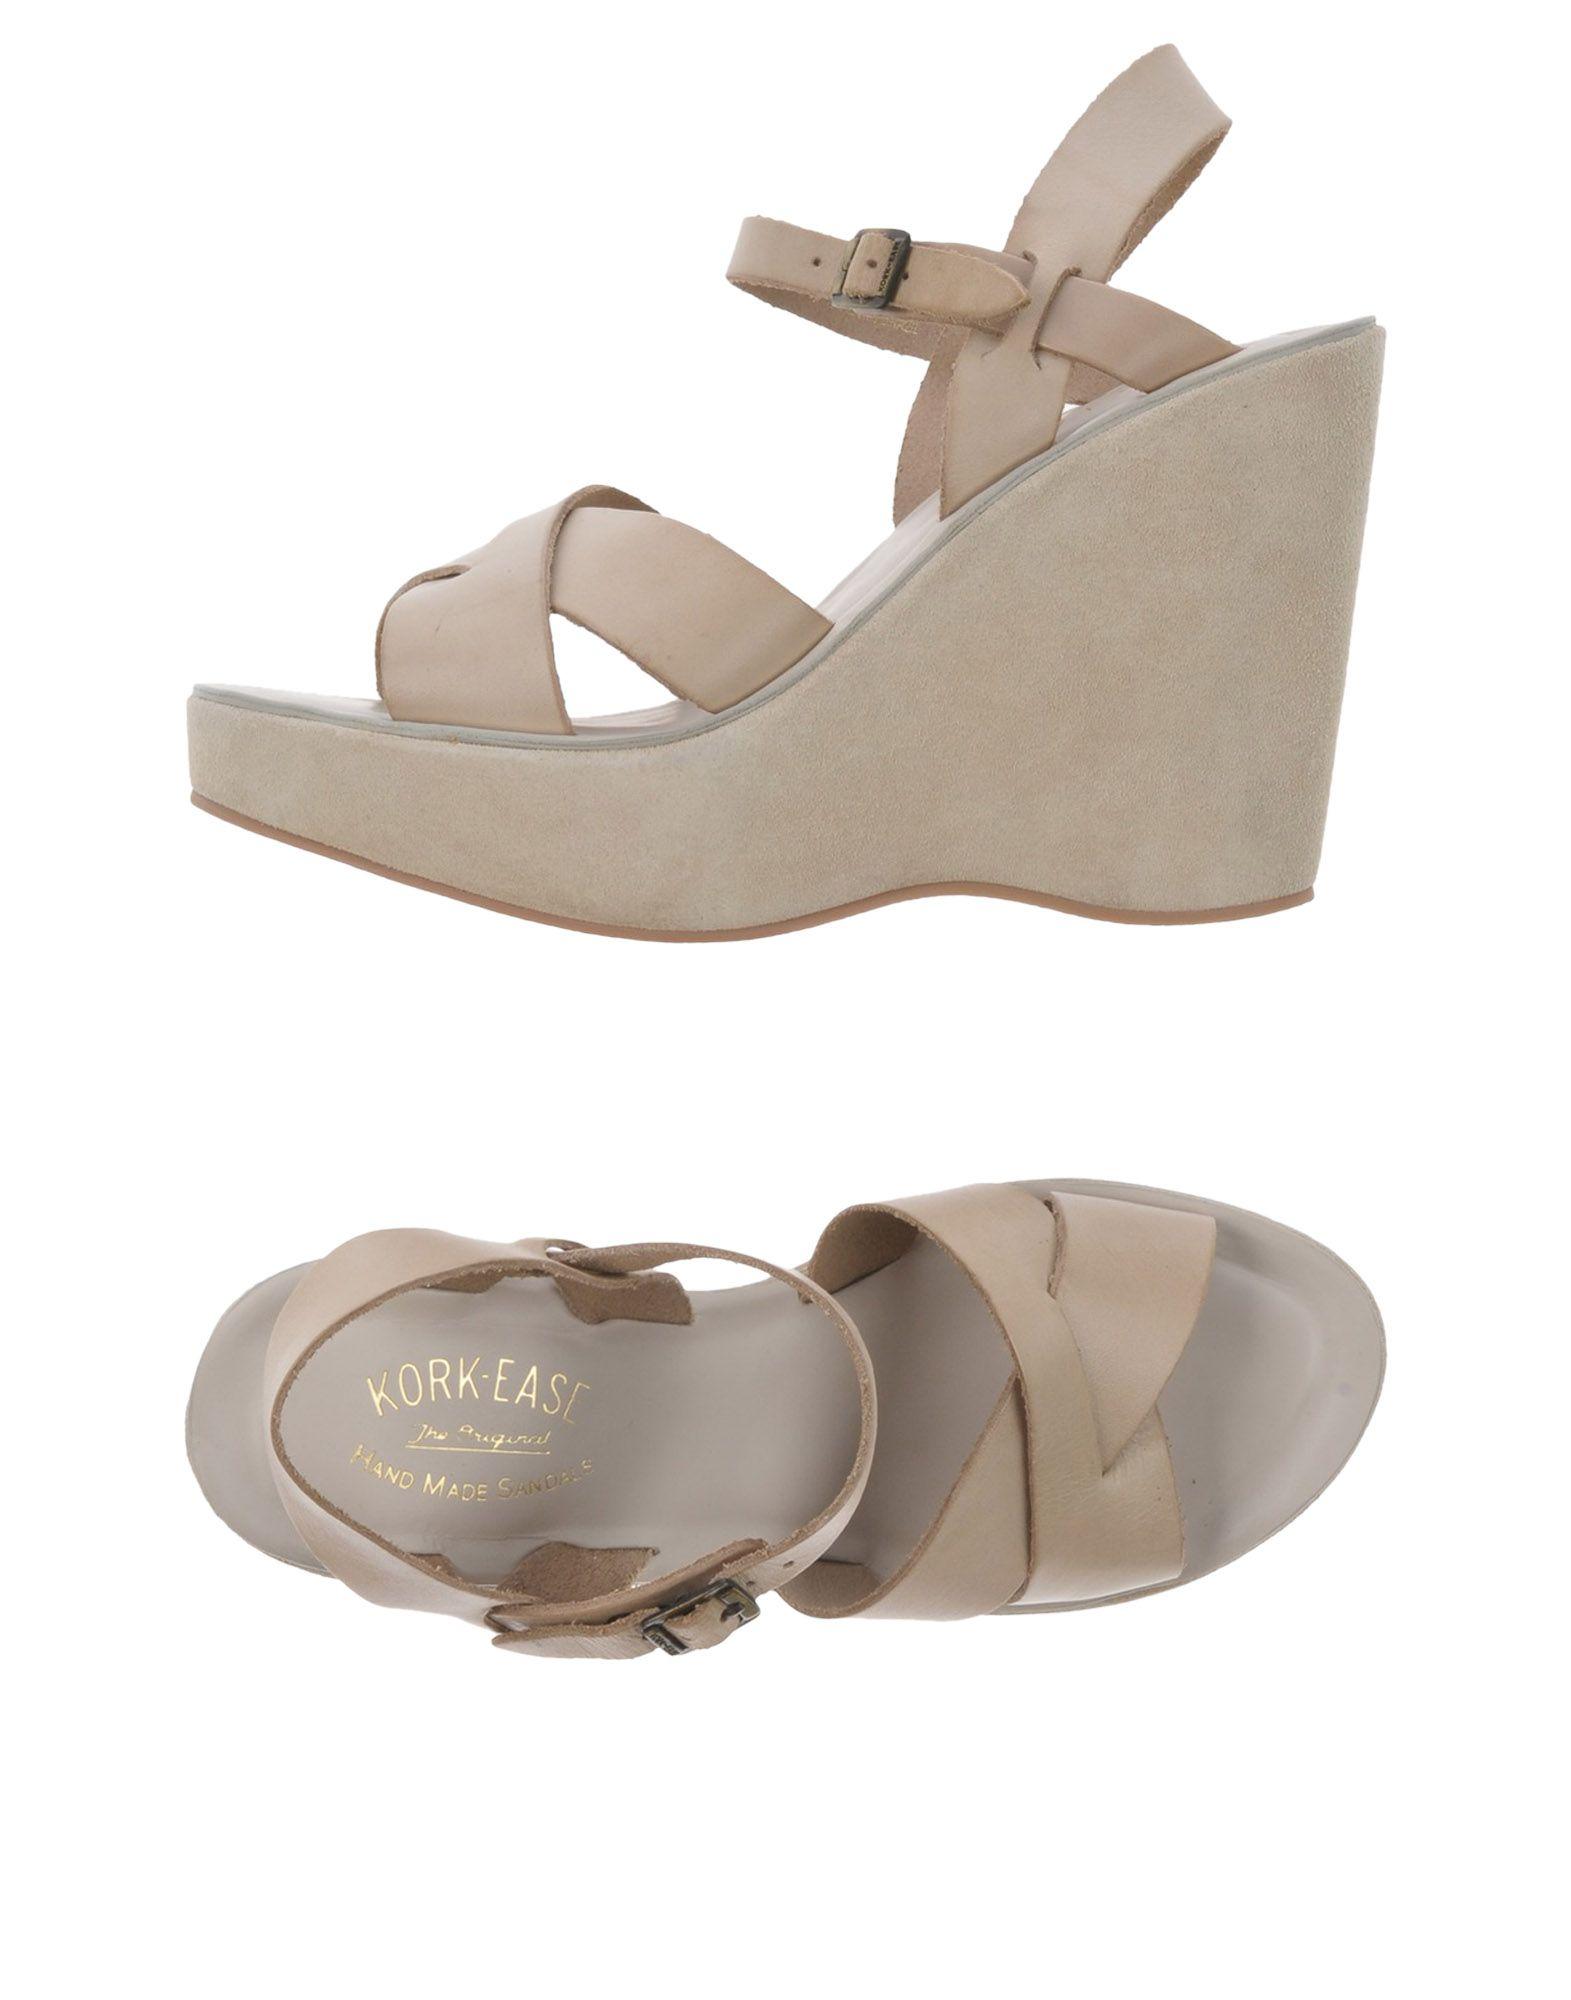 KORK-EASE Sandals in Beige